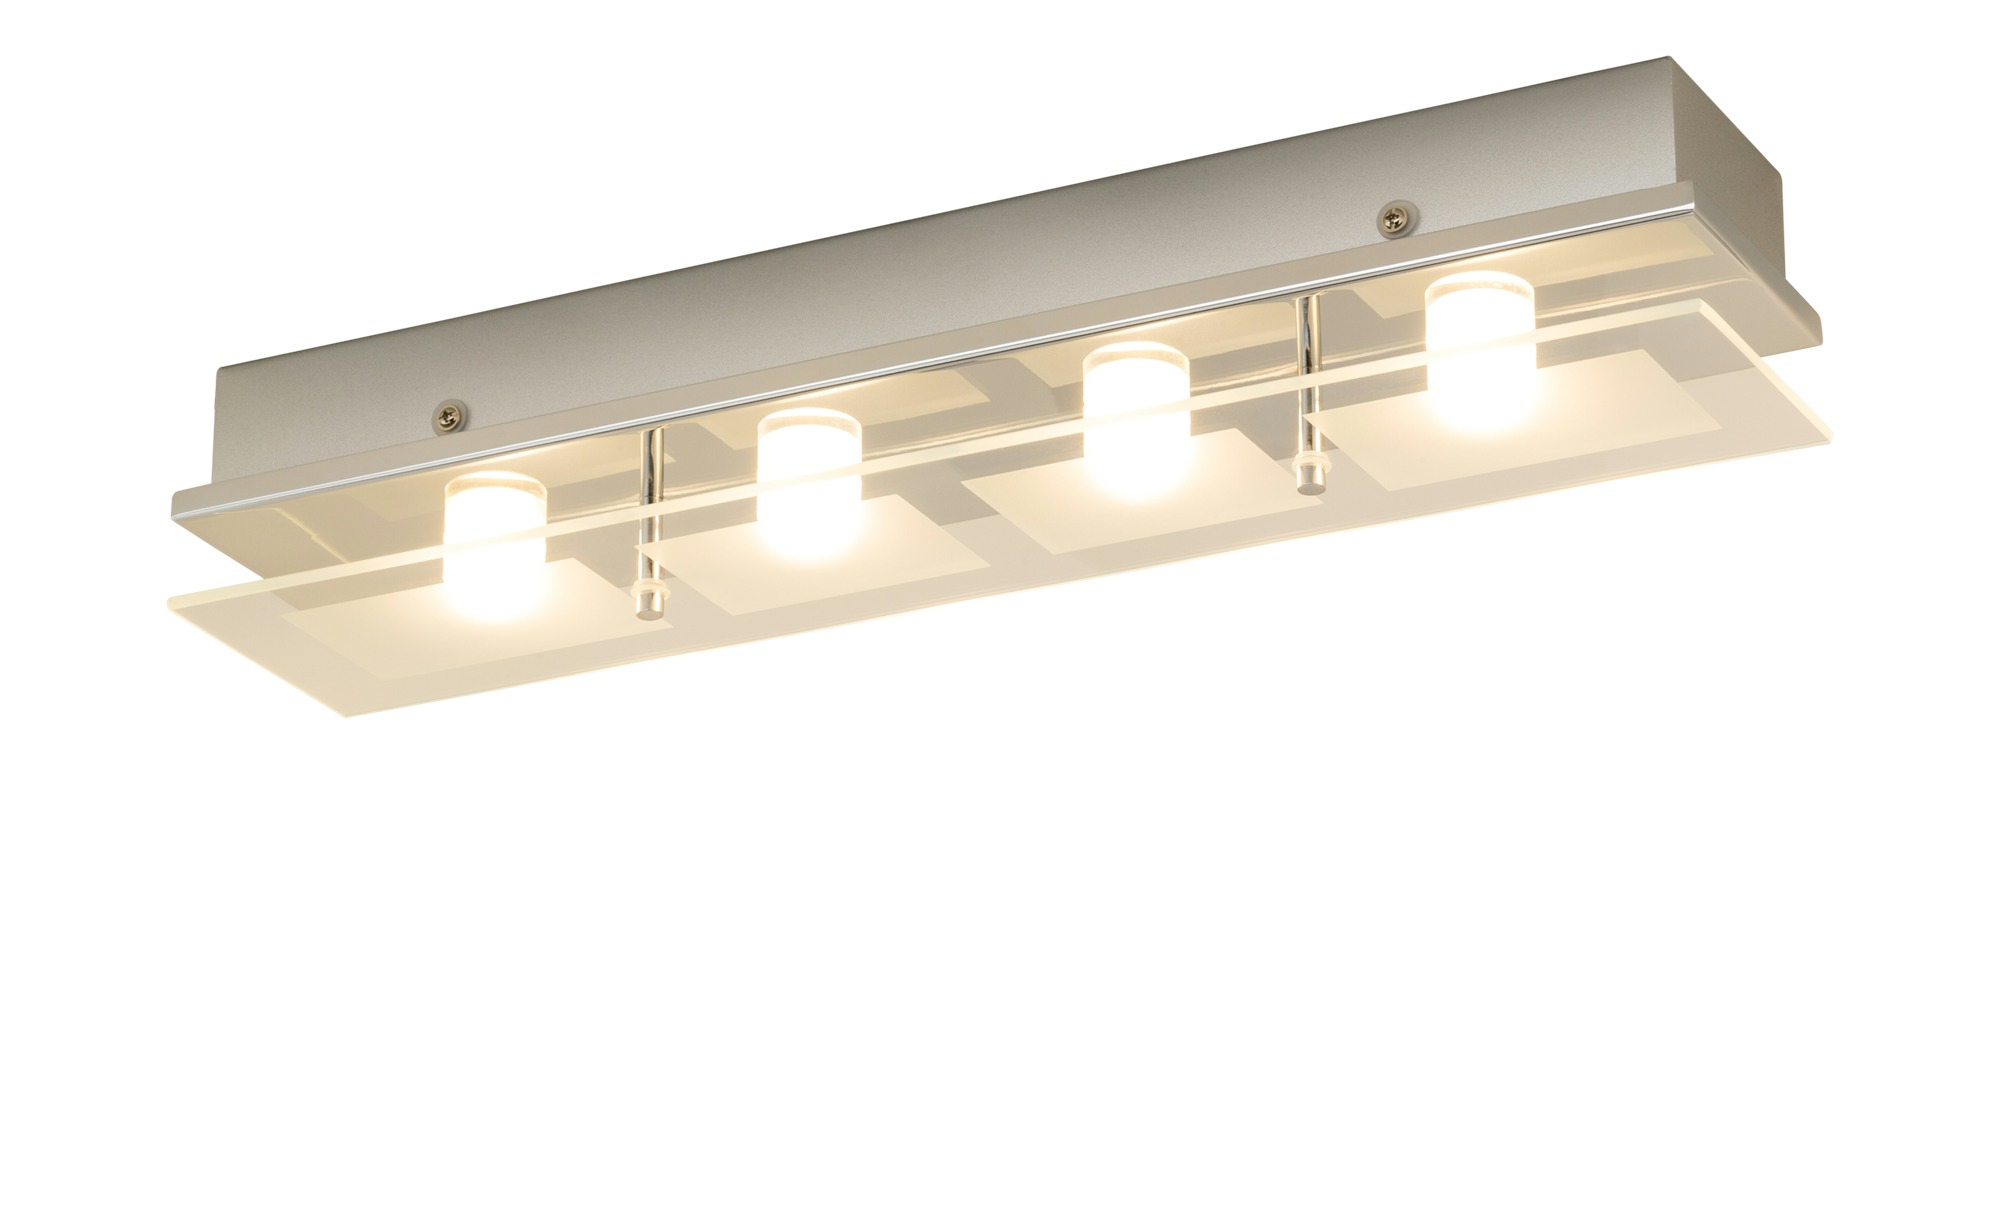 Paul Neuhaus LED Deckenleuchte rechteckig 4 Spots ¦ silber ¦ Maße (cm): B: 48 Lampen & Leuchten > Innenleuchten > Deckenleuchten - Höffner